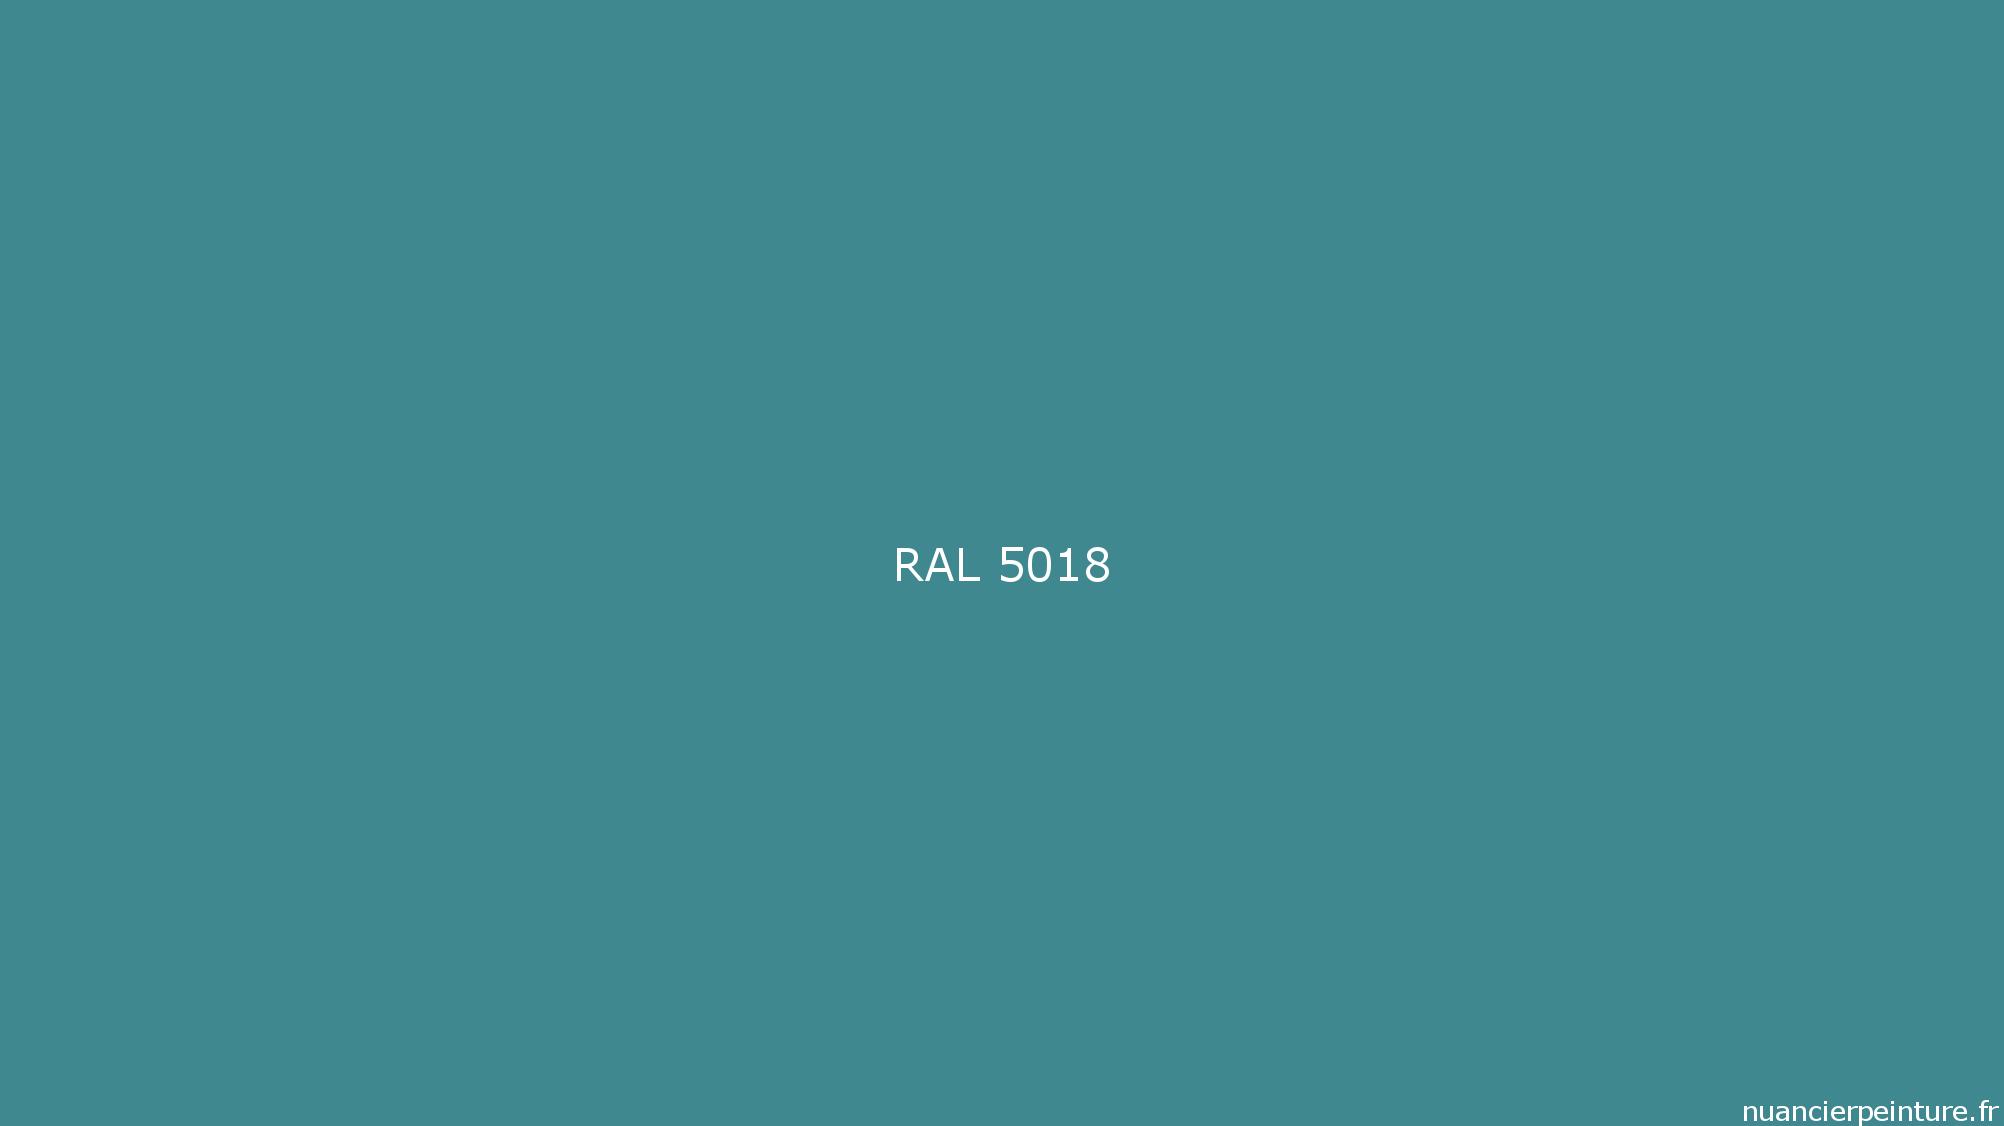 Ral 5018 Peinture Ral 5018 Bleu Turquoise Nuancierpeinture Fr